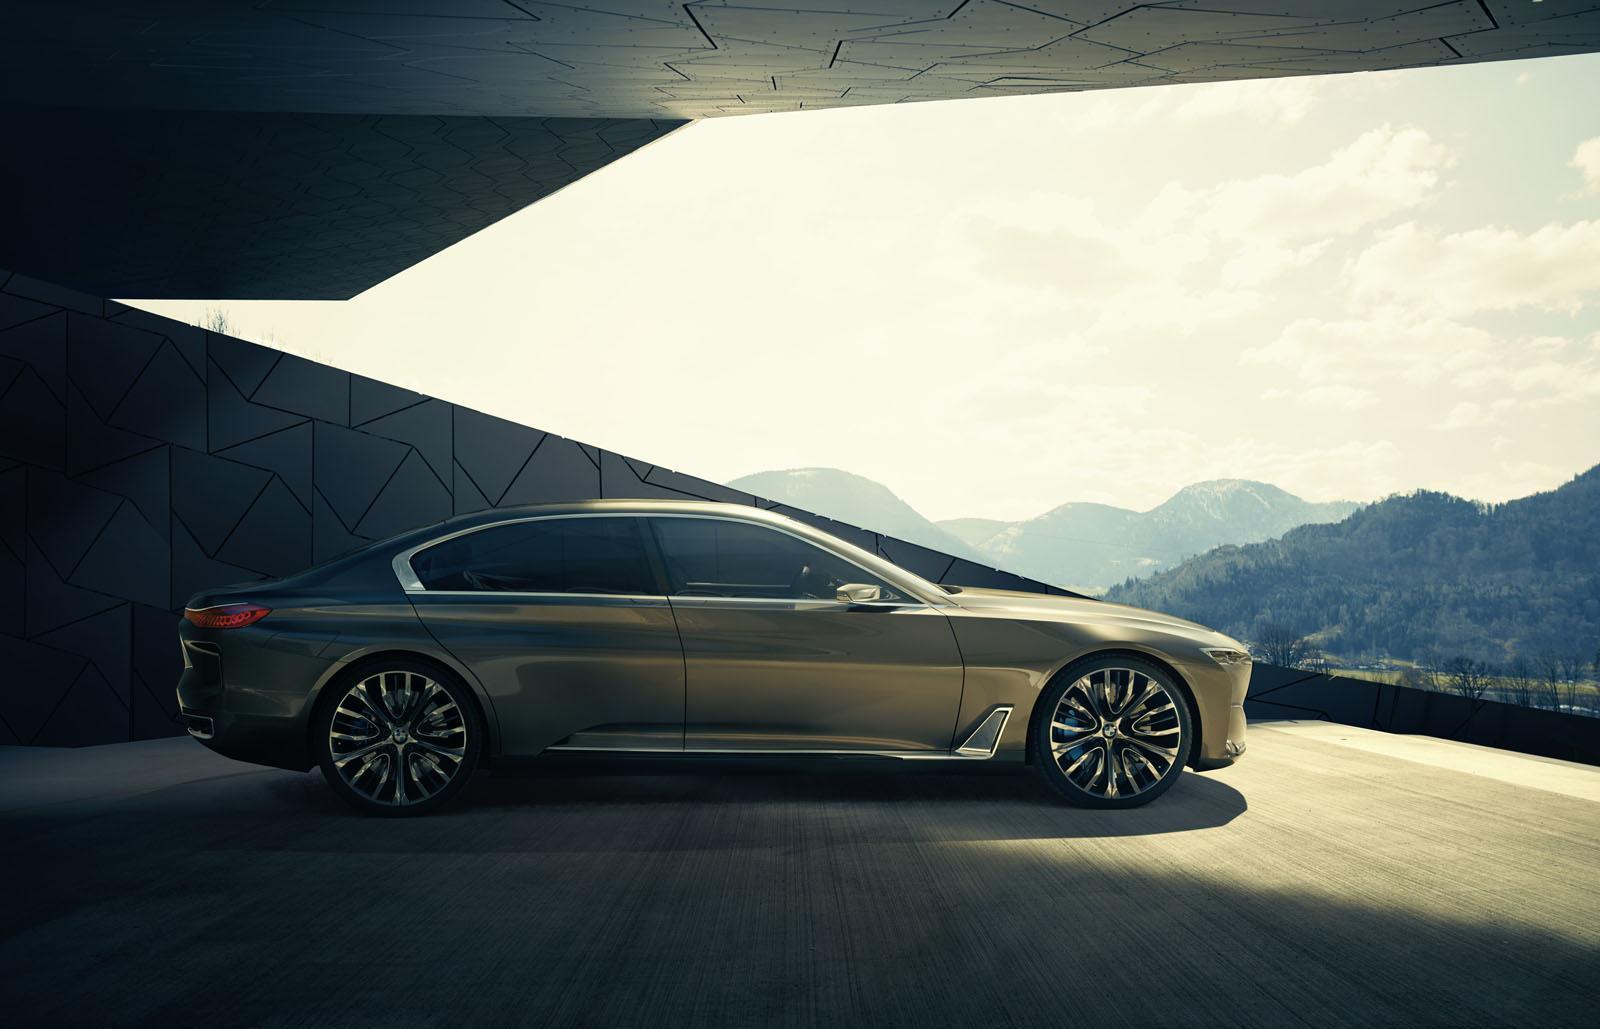 BMW Vision Future Luxury concept press image